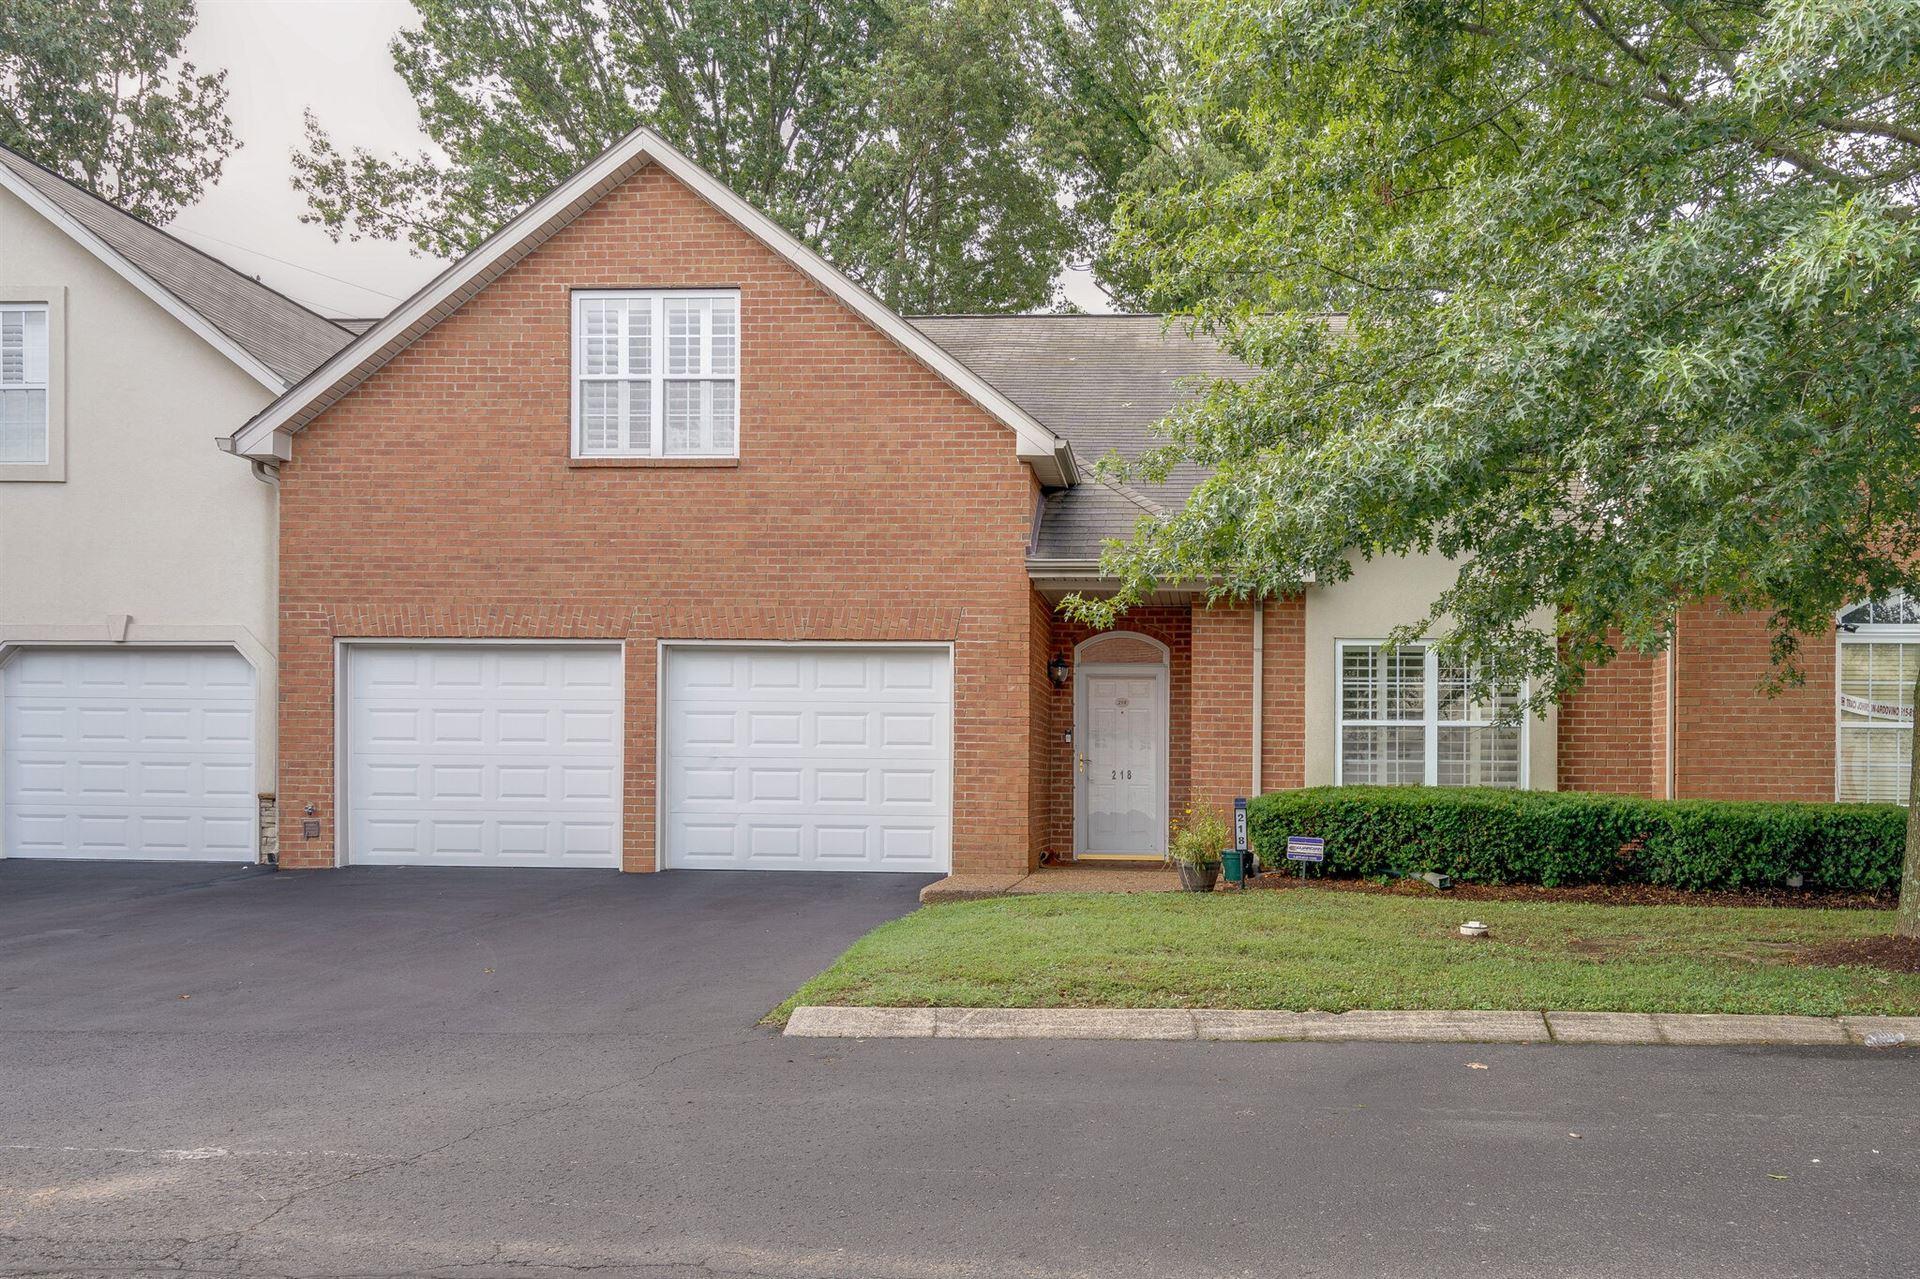 2521 Pennington Bend Rd #216, Nashville, TN 37214 - MLS#: 2272595